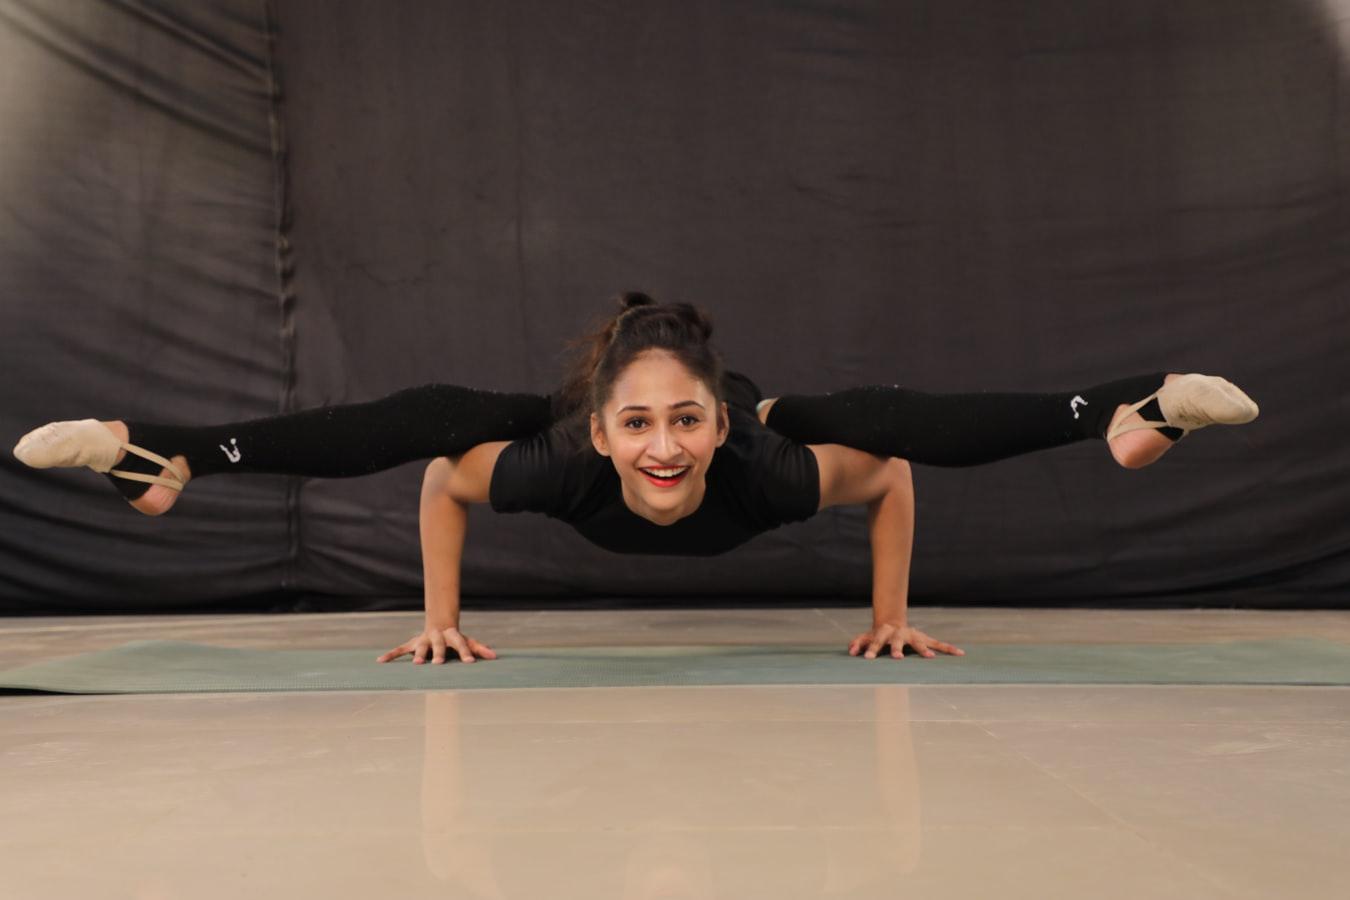 Great examples of rhythmic gymnastics music